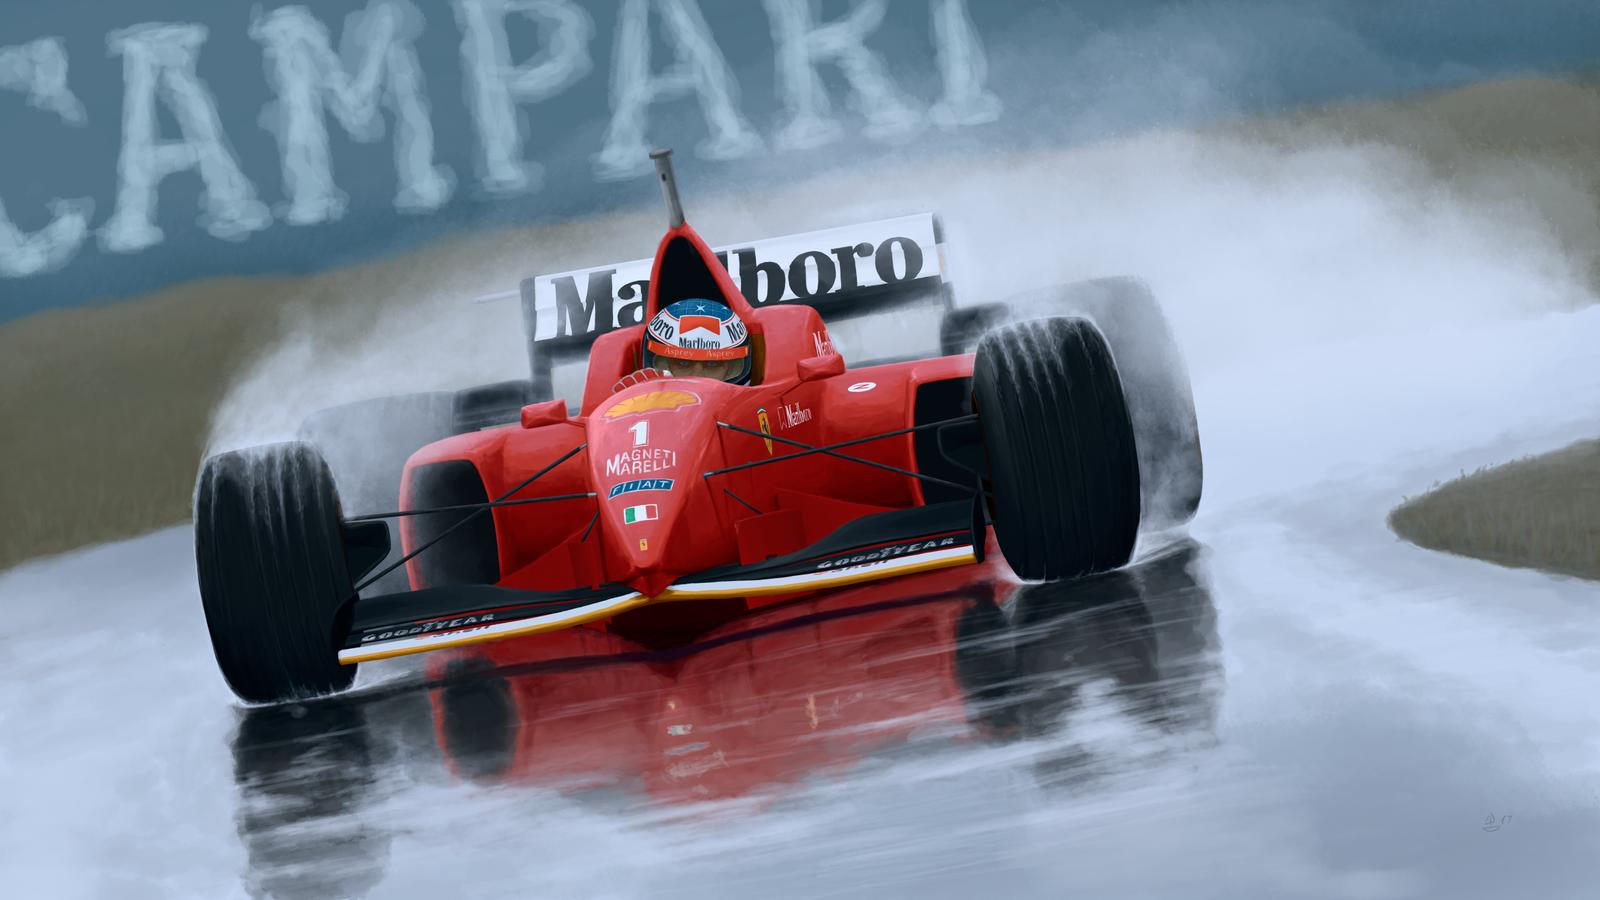 Michael Schumacher, Hiszpania 1996 Zapowiedź GP Hiszpanii 2018